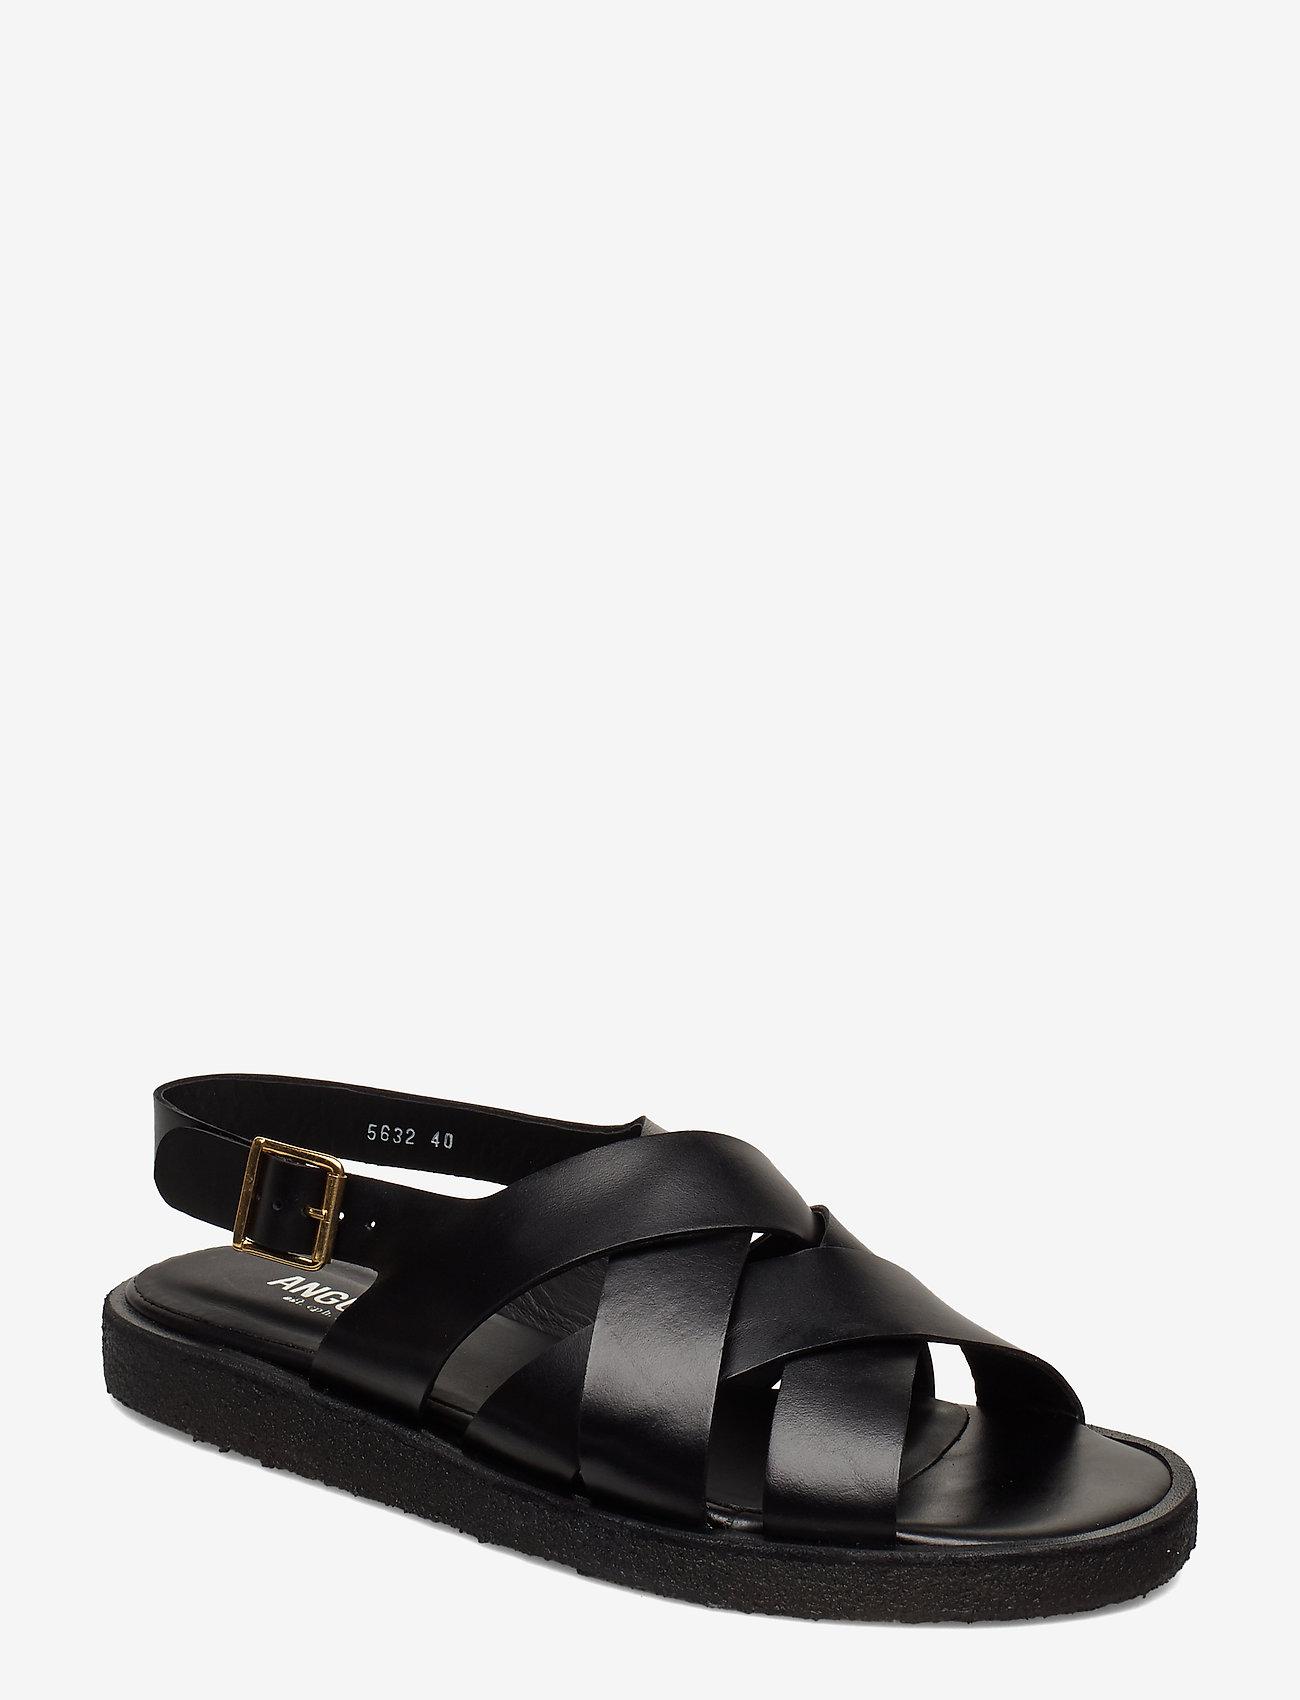 ANGULUS - Sandals - flat - open toe - op - flache sandalen - 1835 black - 0